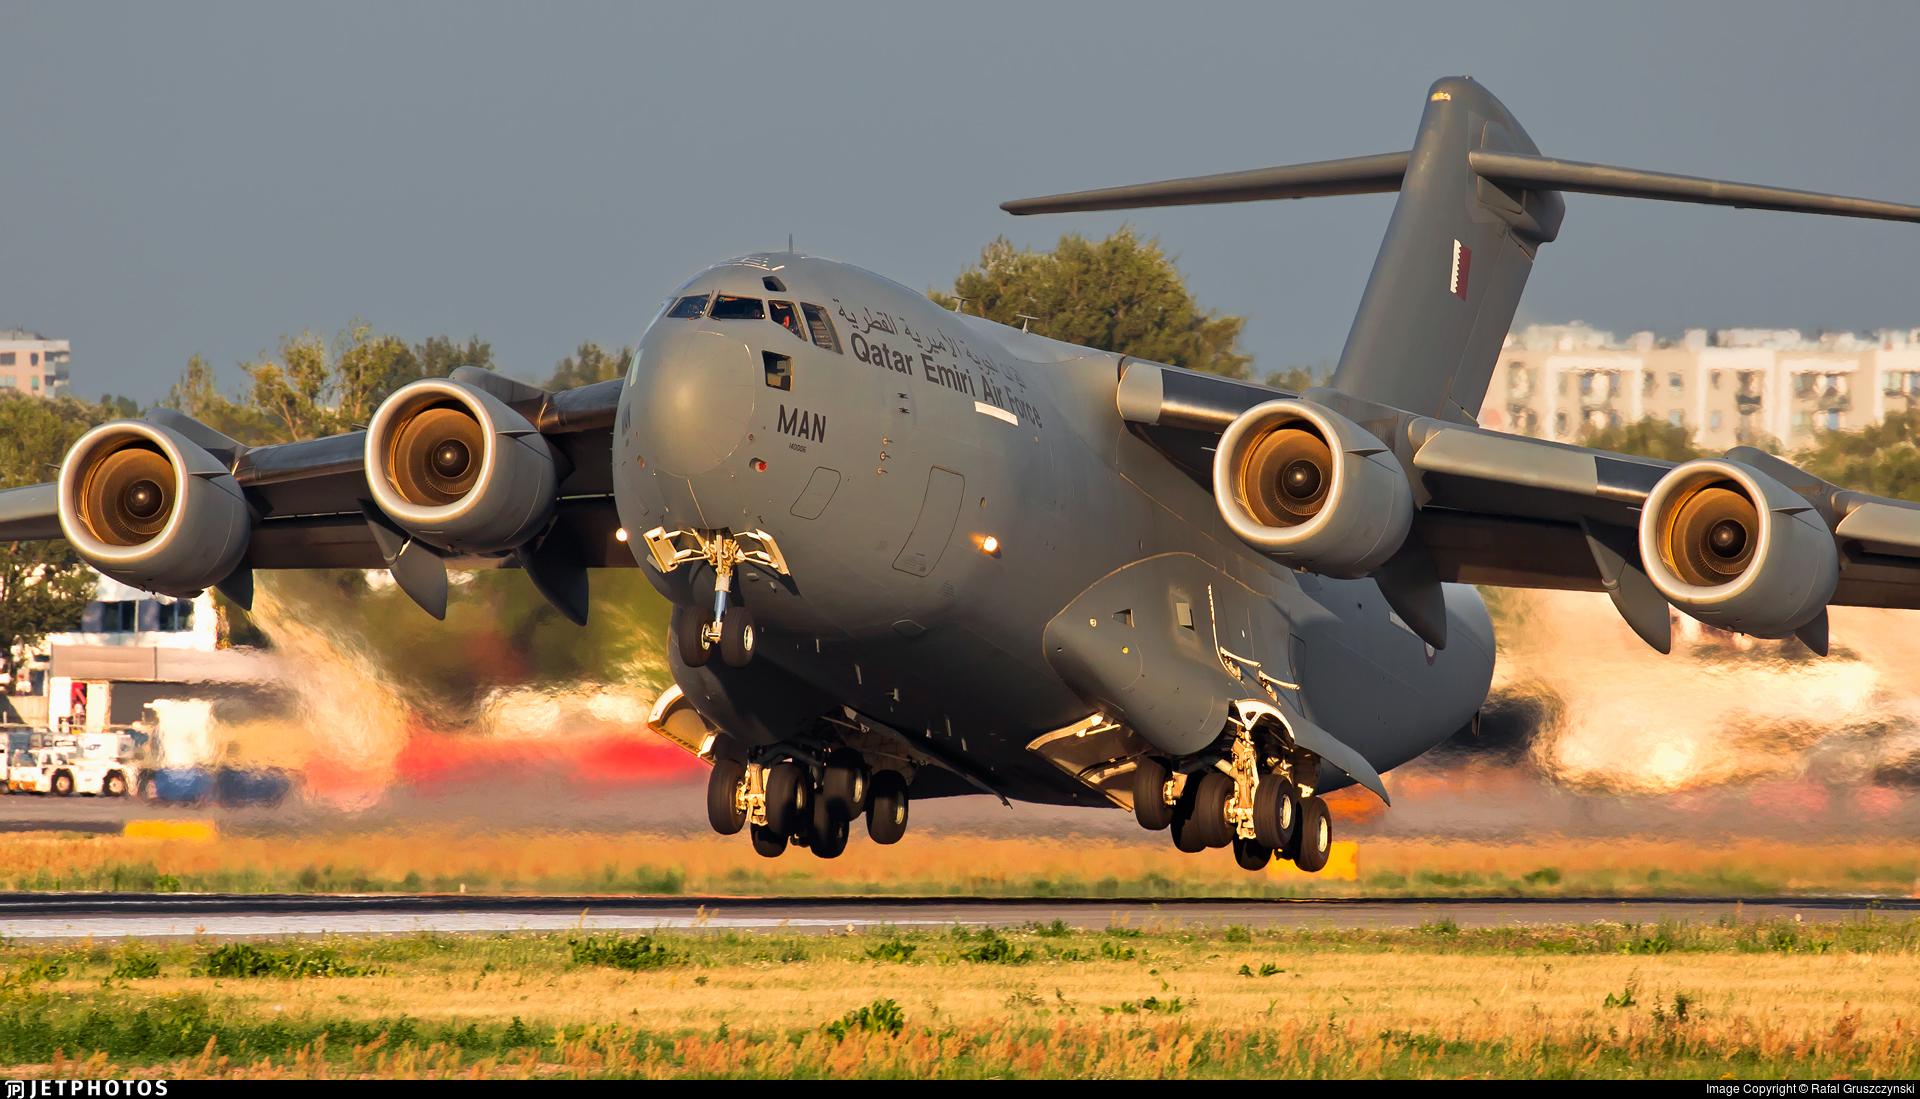 A7-MAN - Boeing C-17A Globemaster III - Qatar - Air Force